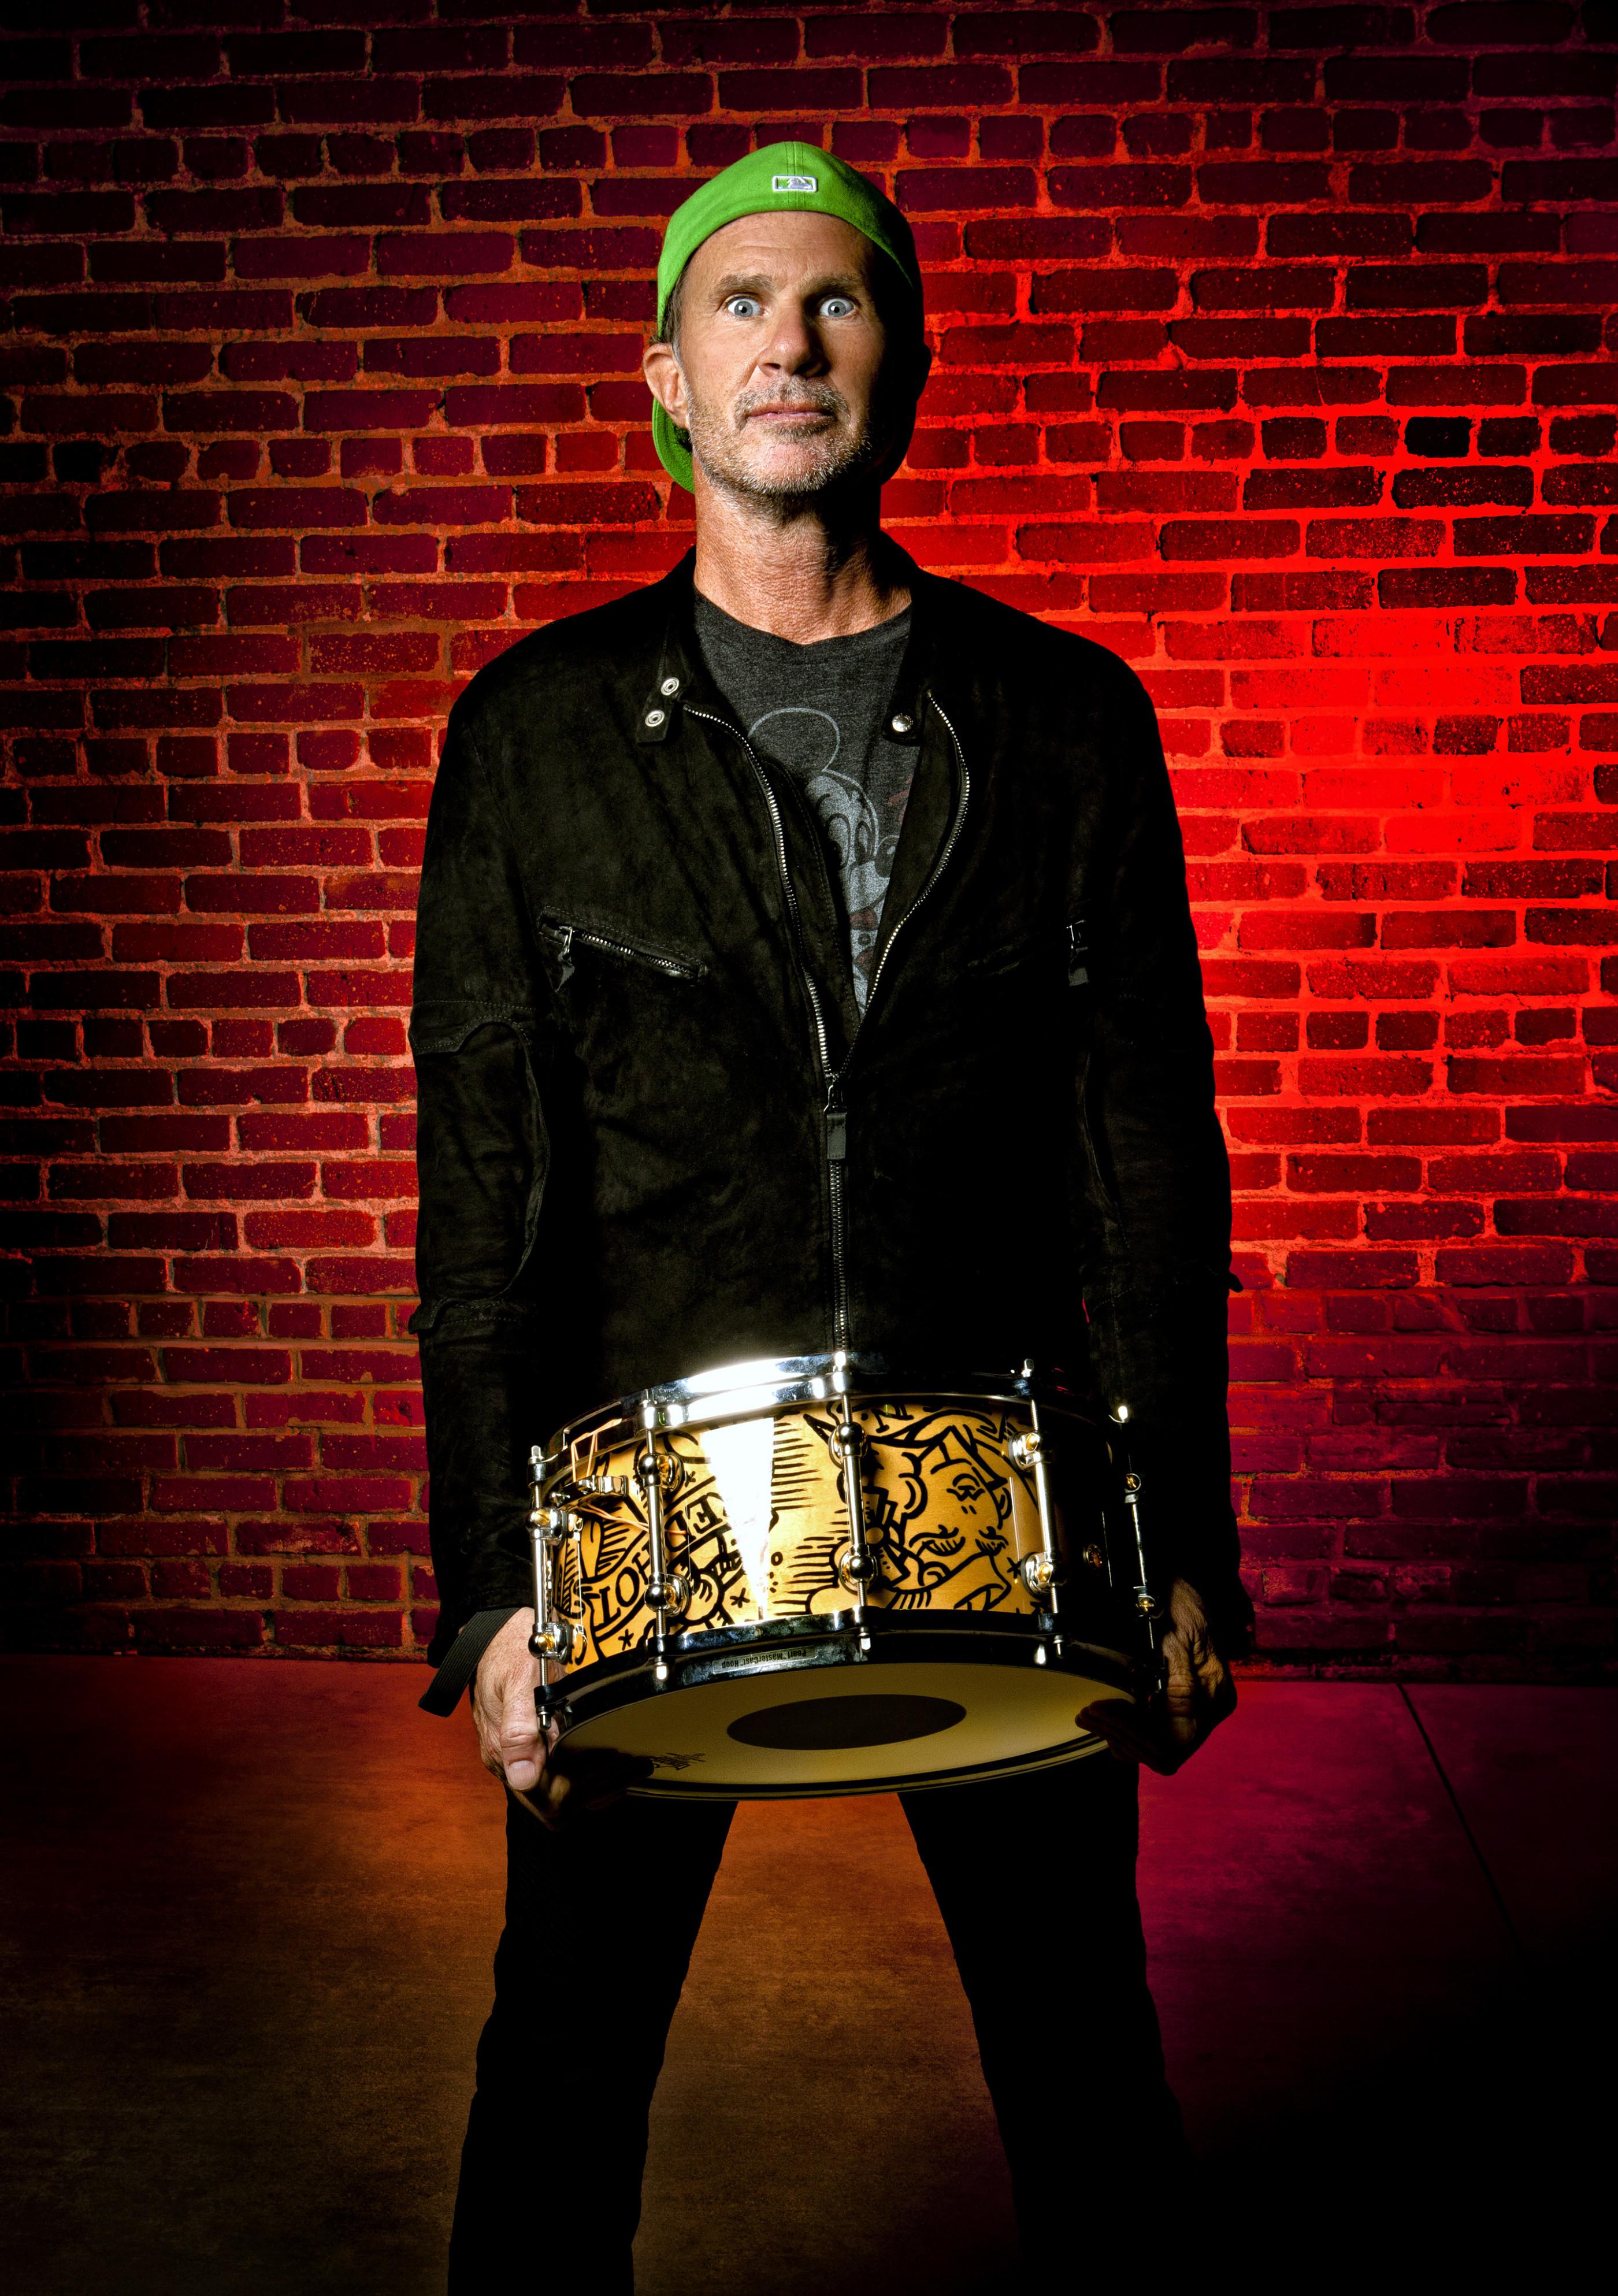 Chad Smith Modern Drummer © Ash Newell